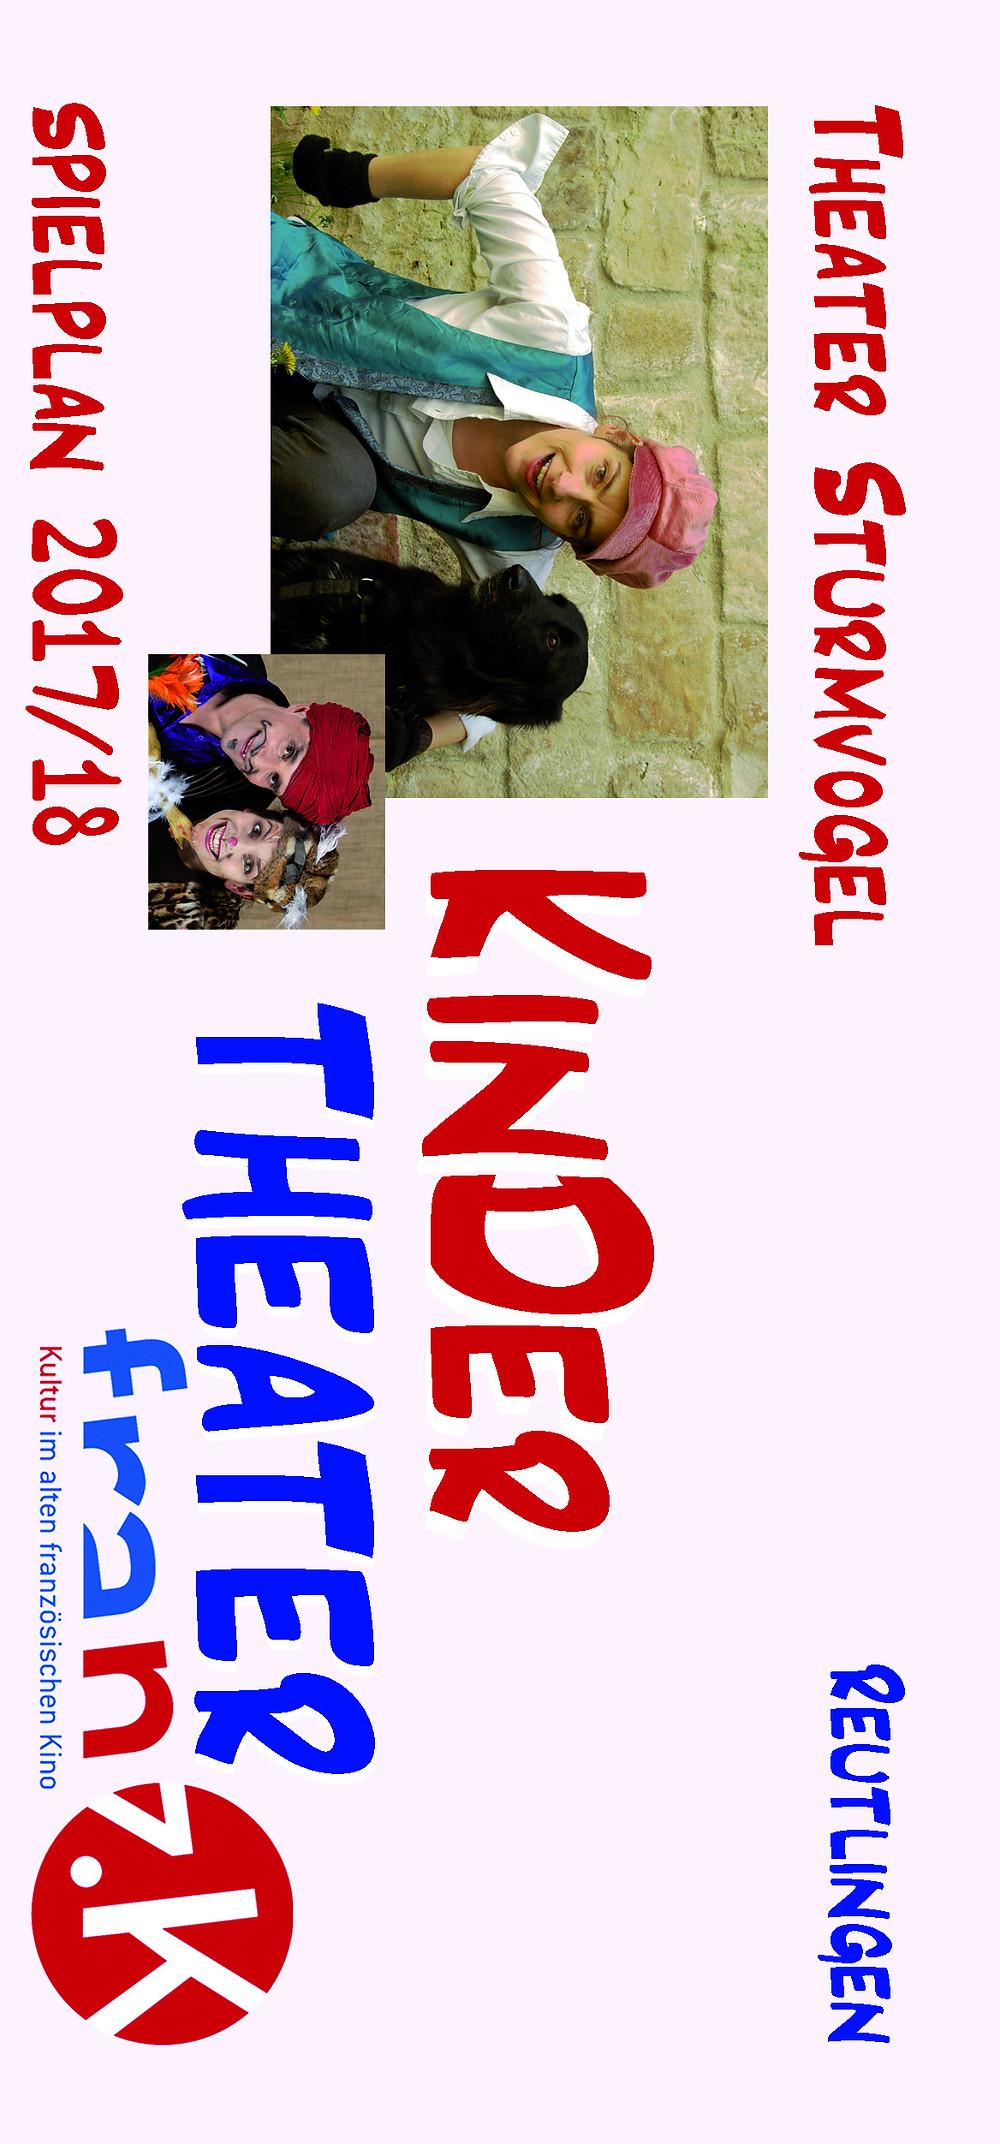 Kindertheater Reutlingen | Flyer franz.k